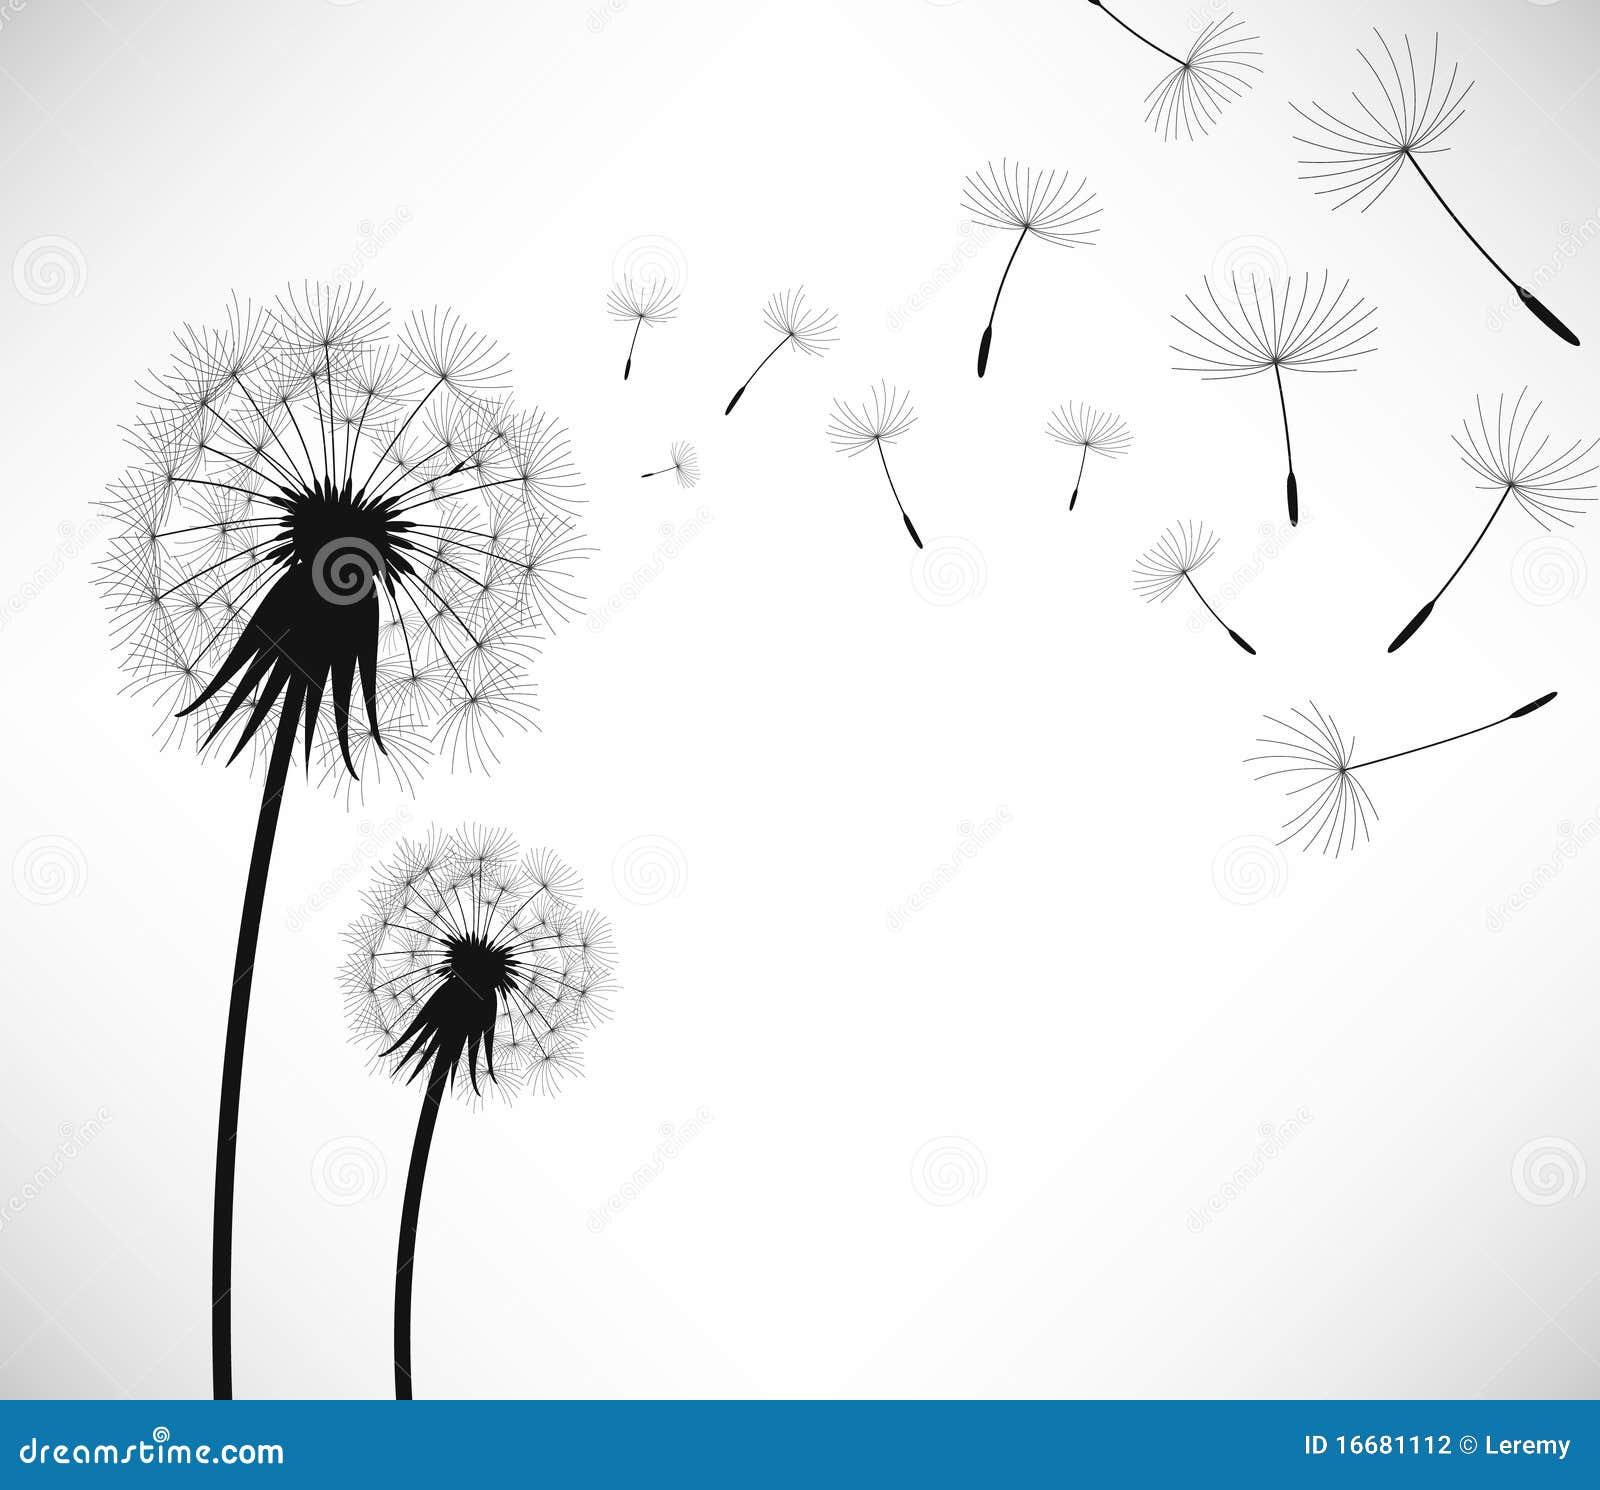 Dandelion Blowing Drawing Dandelion Blowing Drawing Tumblr Dandelion Blow